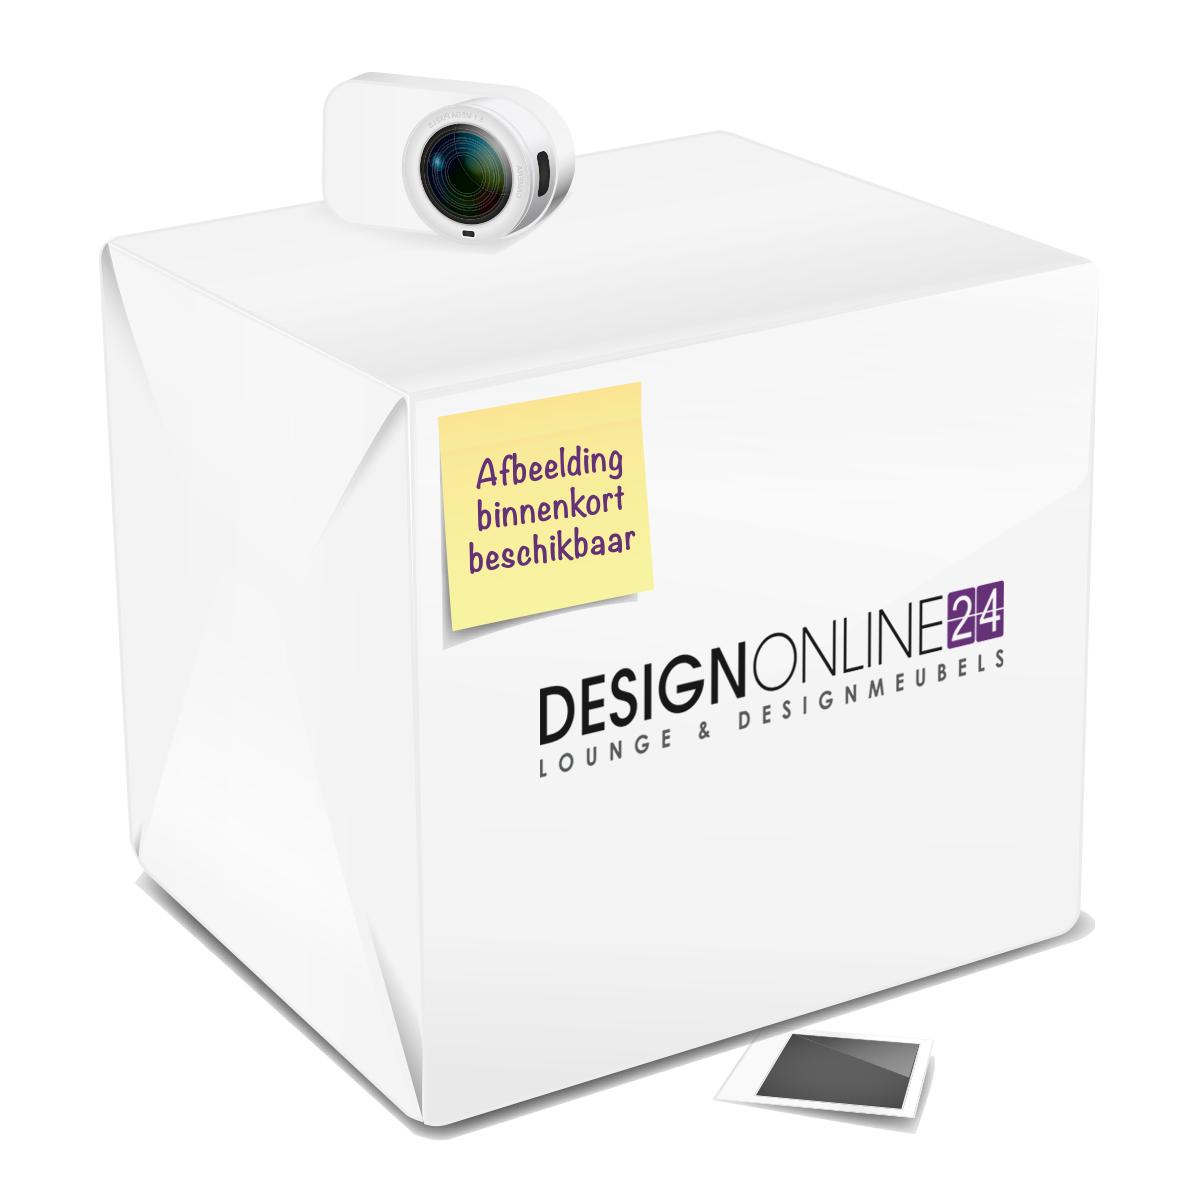 24Designs Draaibare Stoel Leon - Chromen onderstel - Witte kunstleren zitting